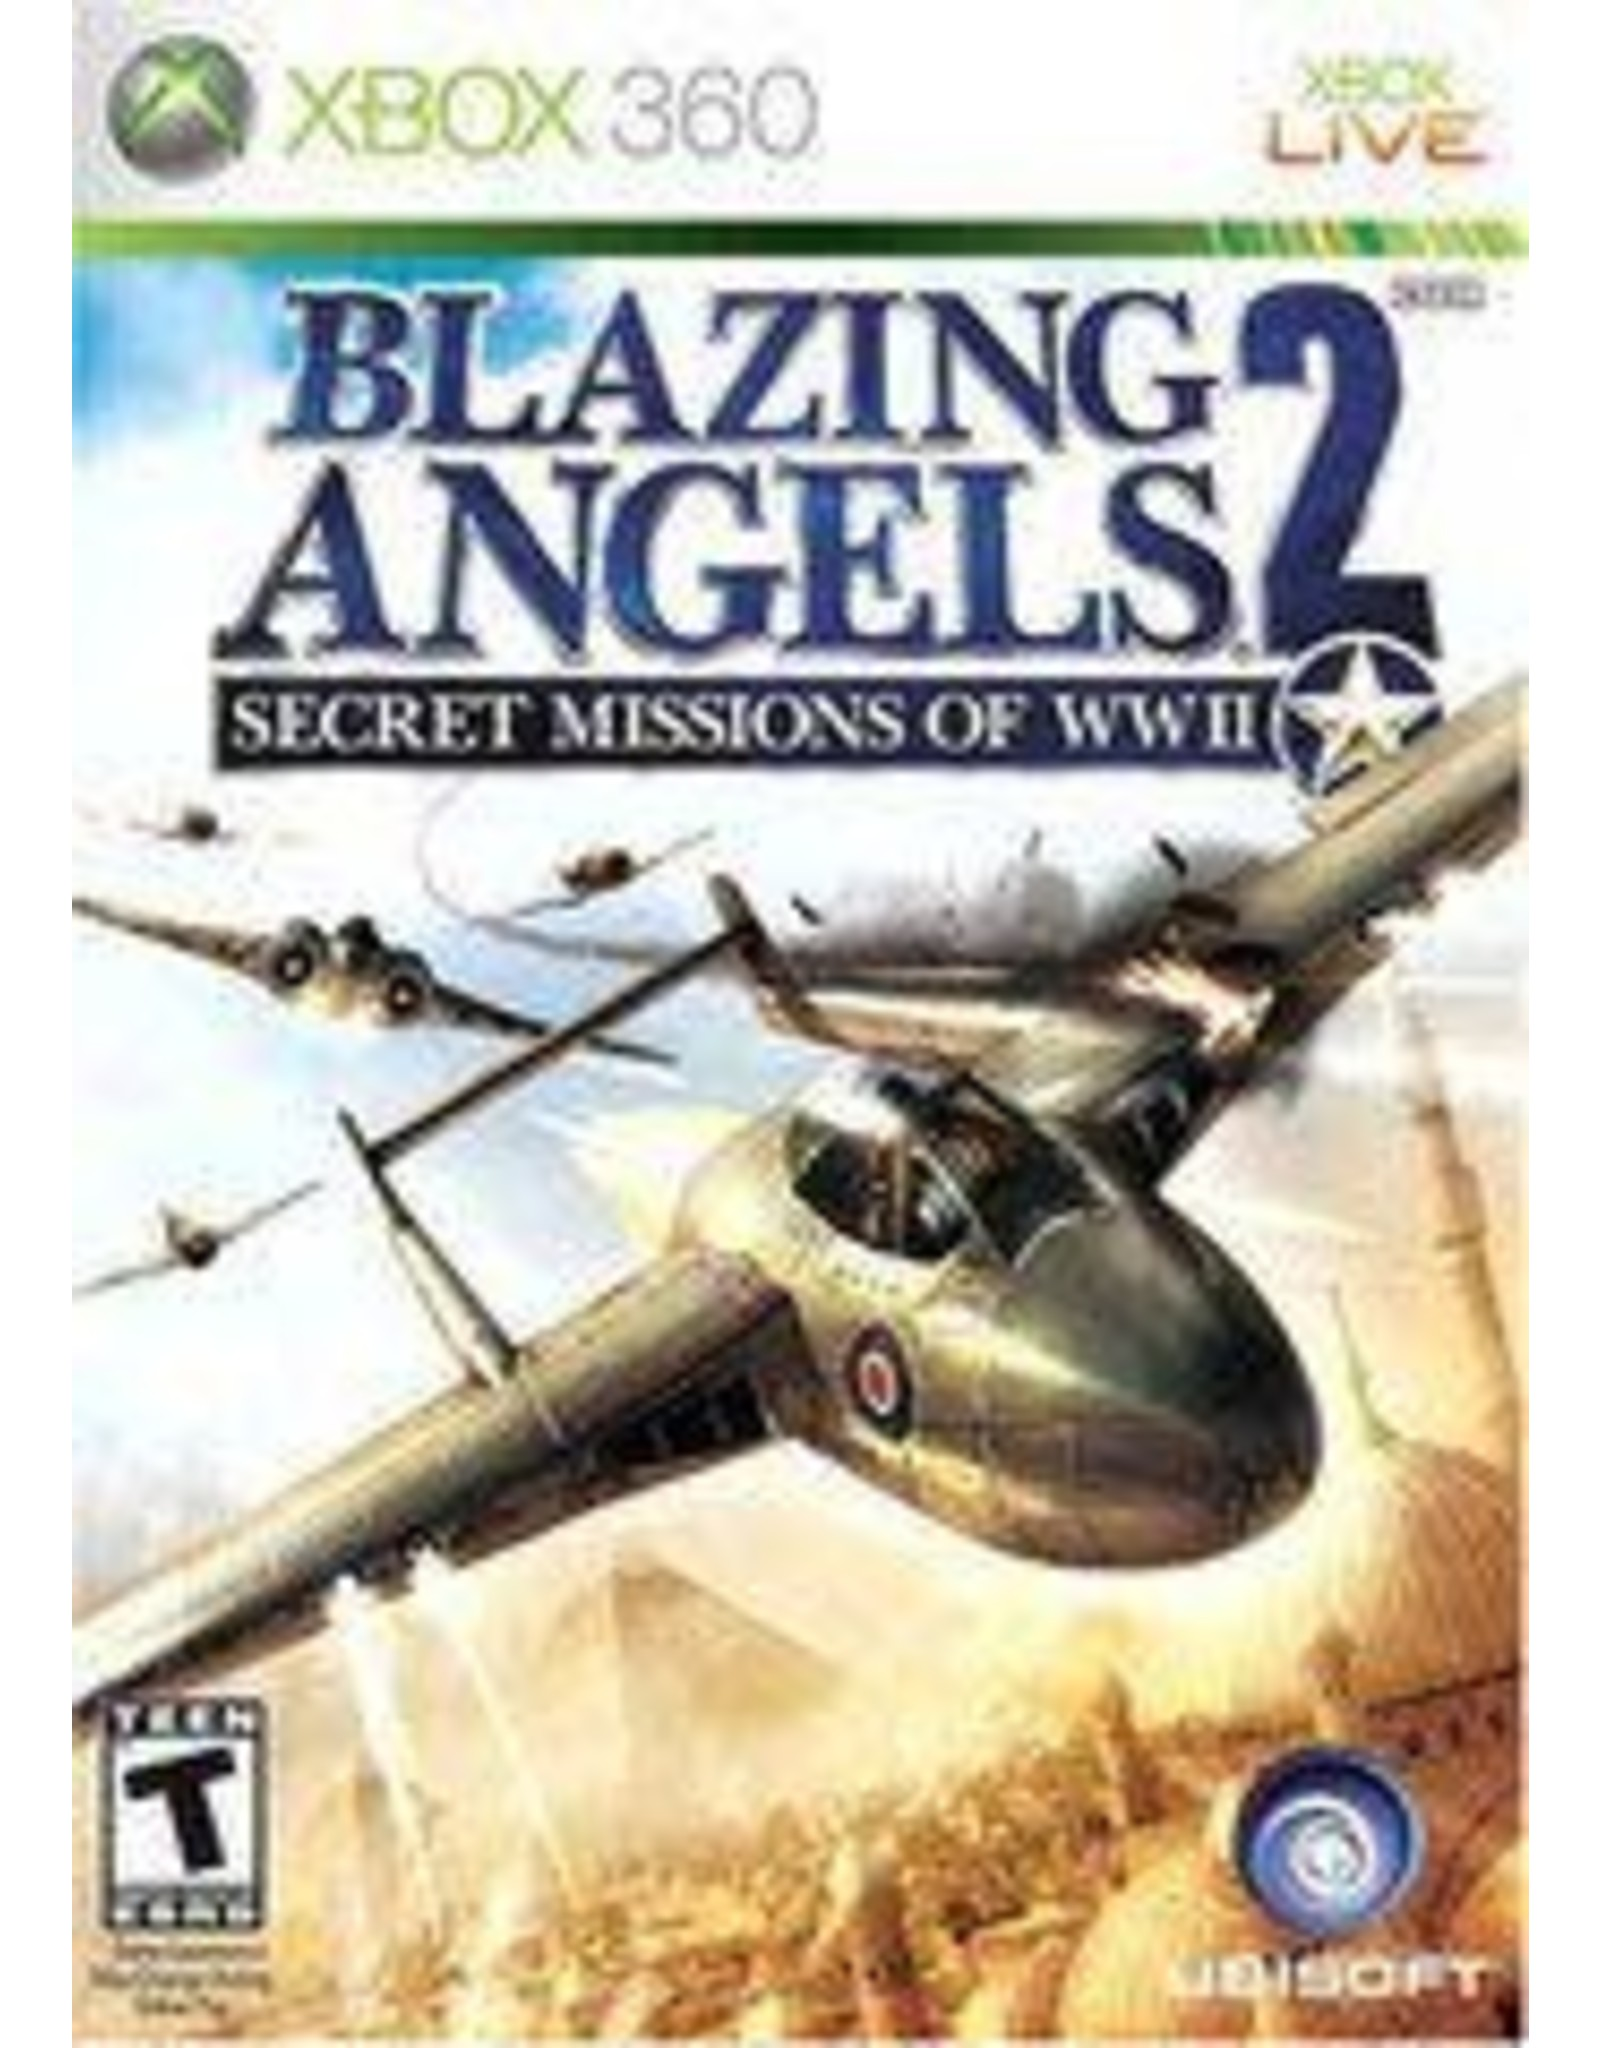 Xbox 360 Blazing Angels 2 Secret Missions of WWII (CiB)